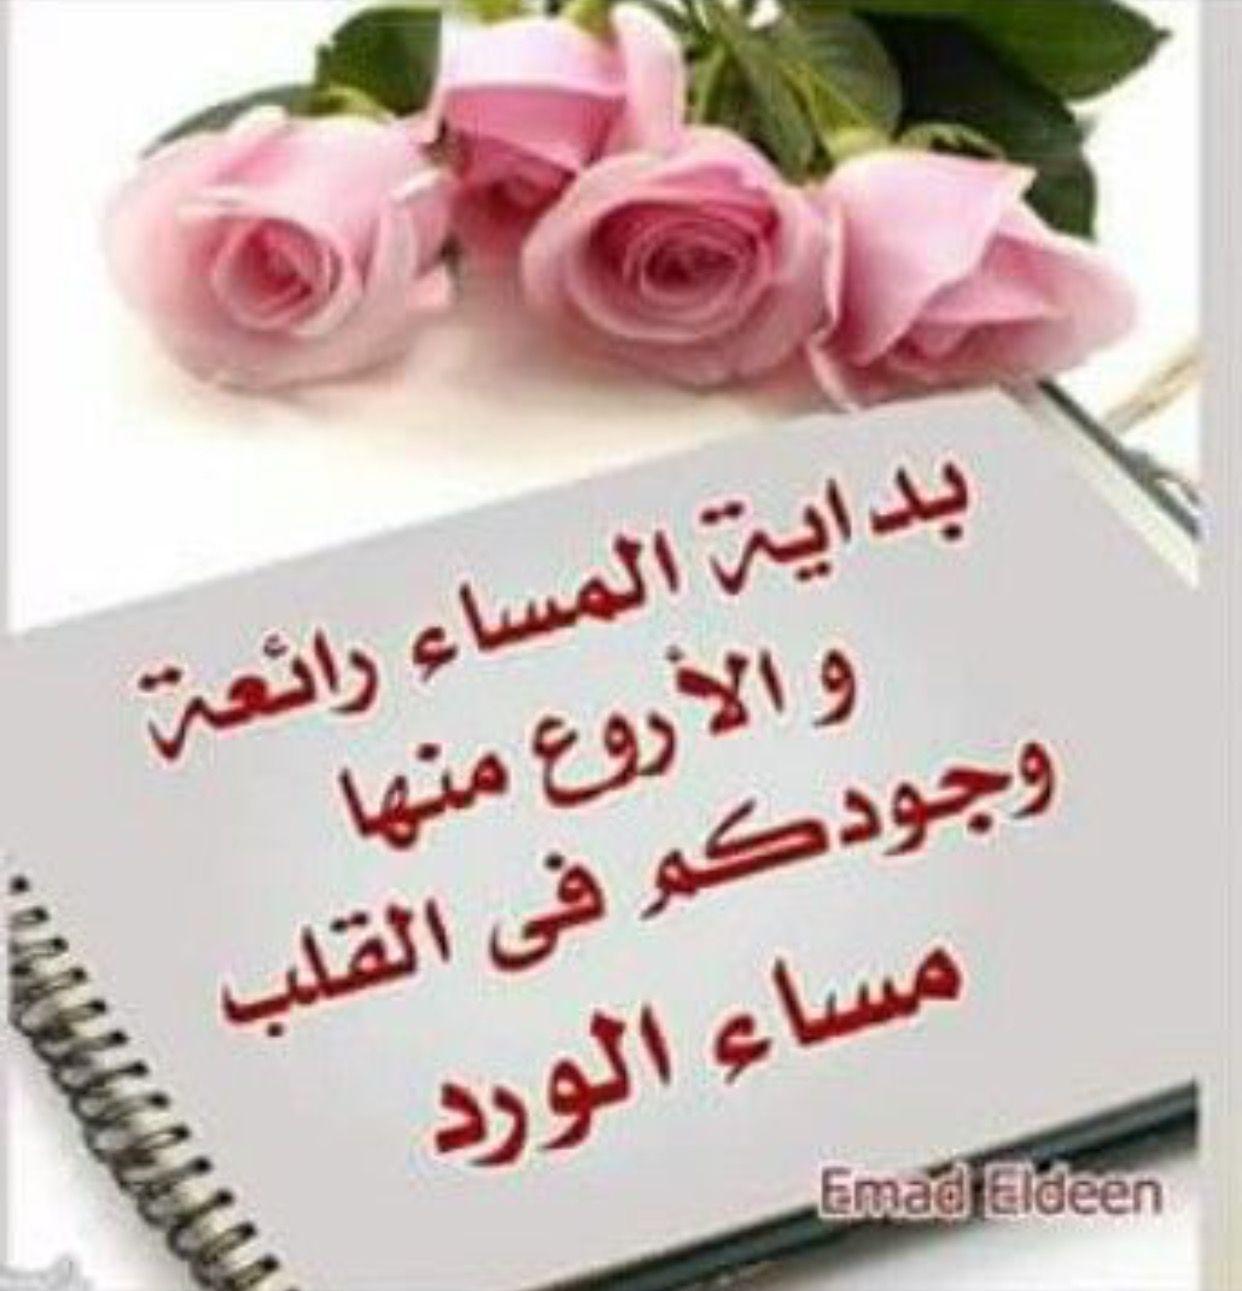 مساء الورد Good Morning Gorgeous Good Morning Good Night Good Evening